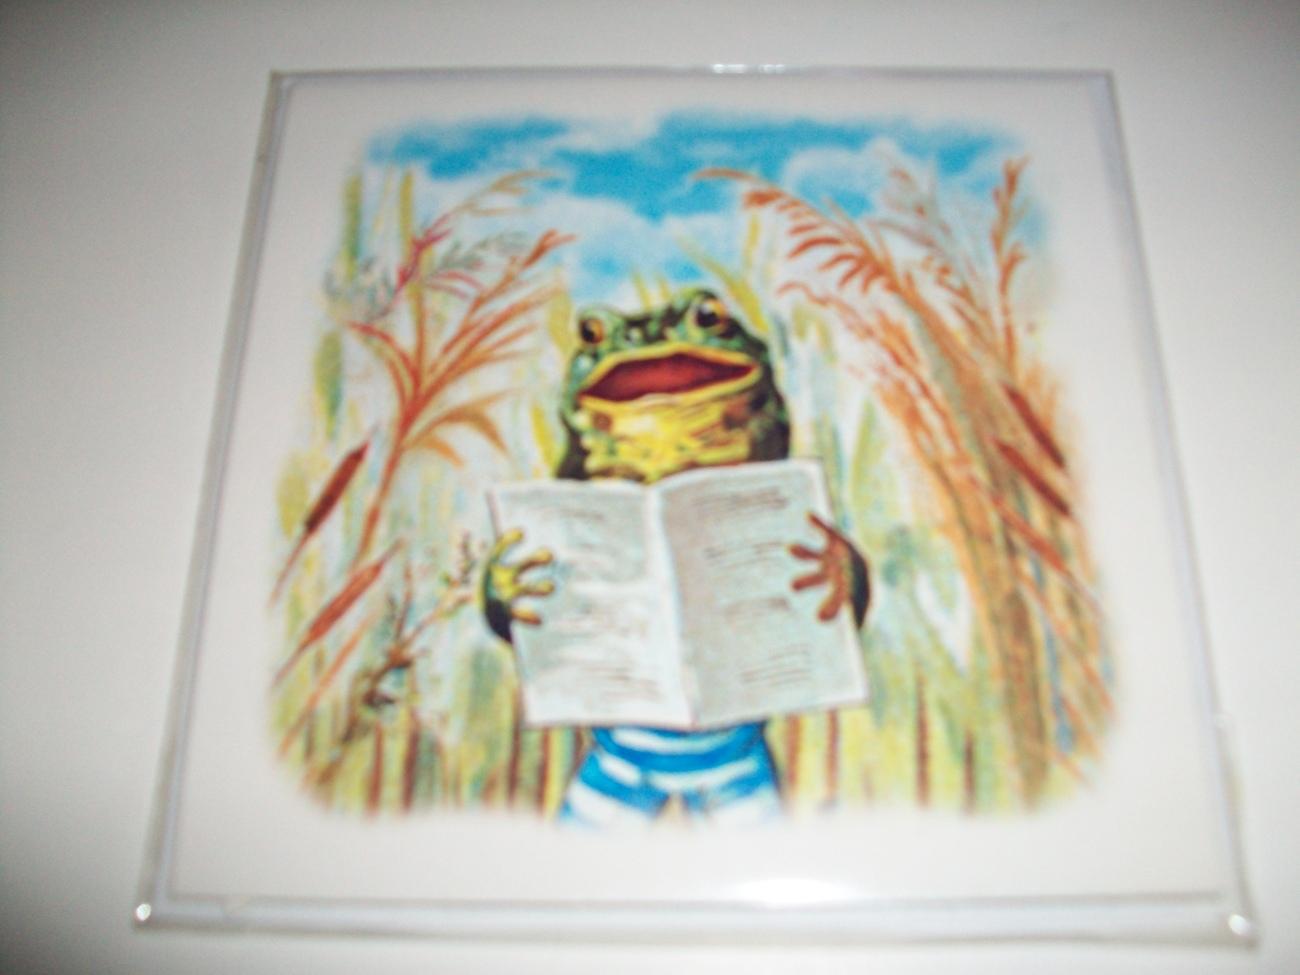 Pop-Shots Froggy Birthday Pop-Up Greeting Card image 2